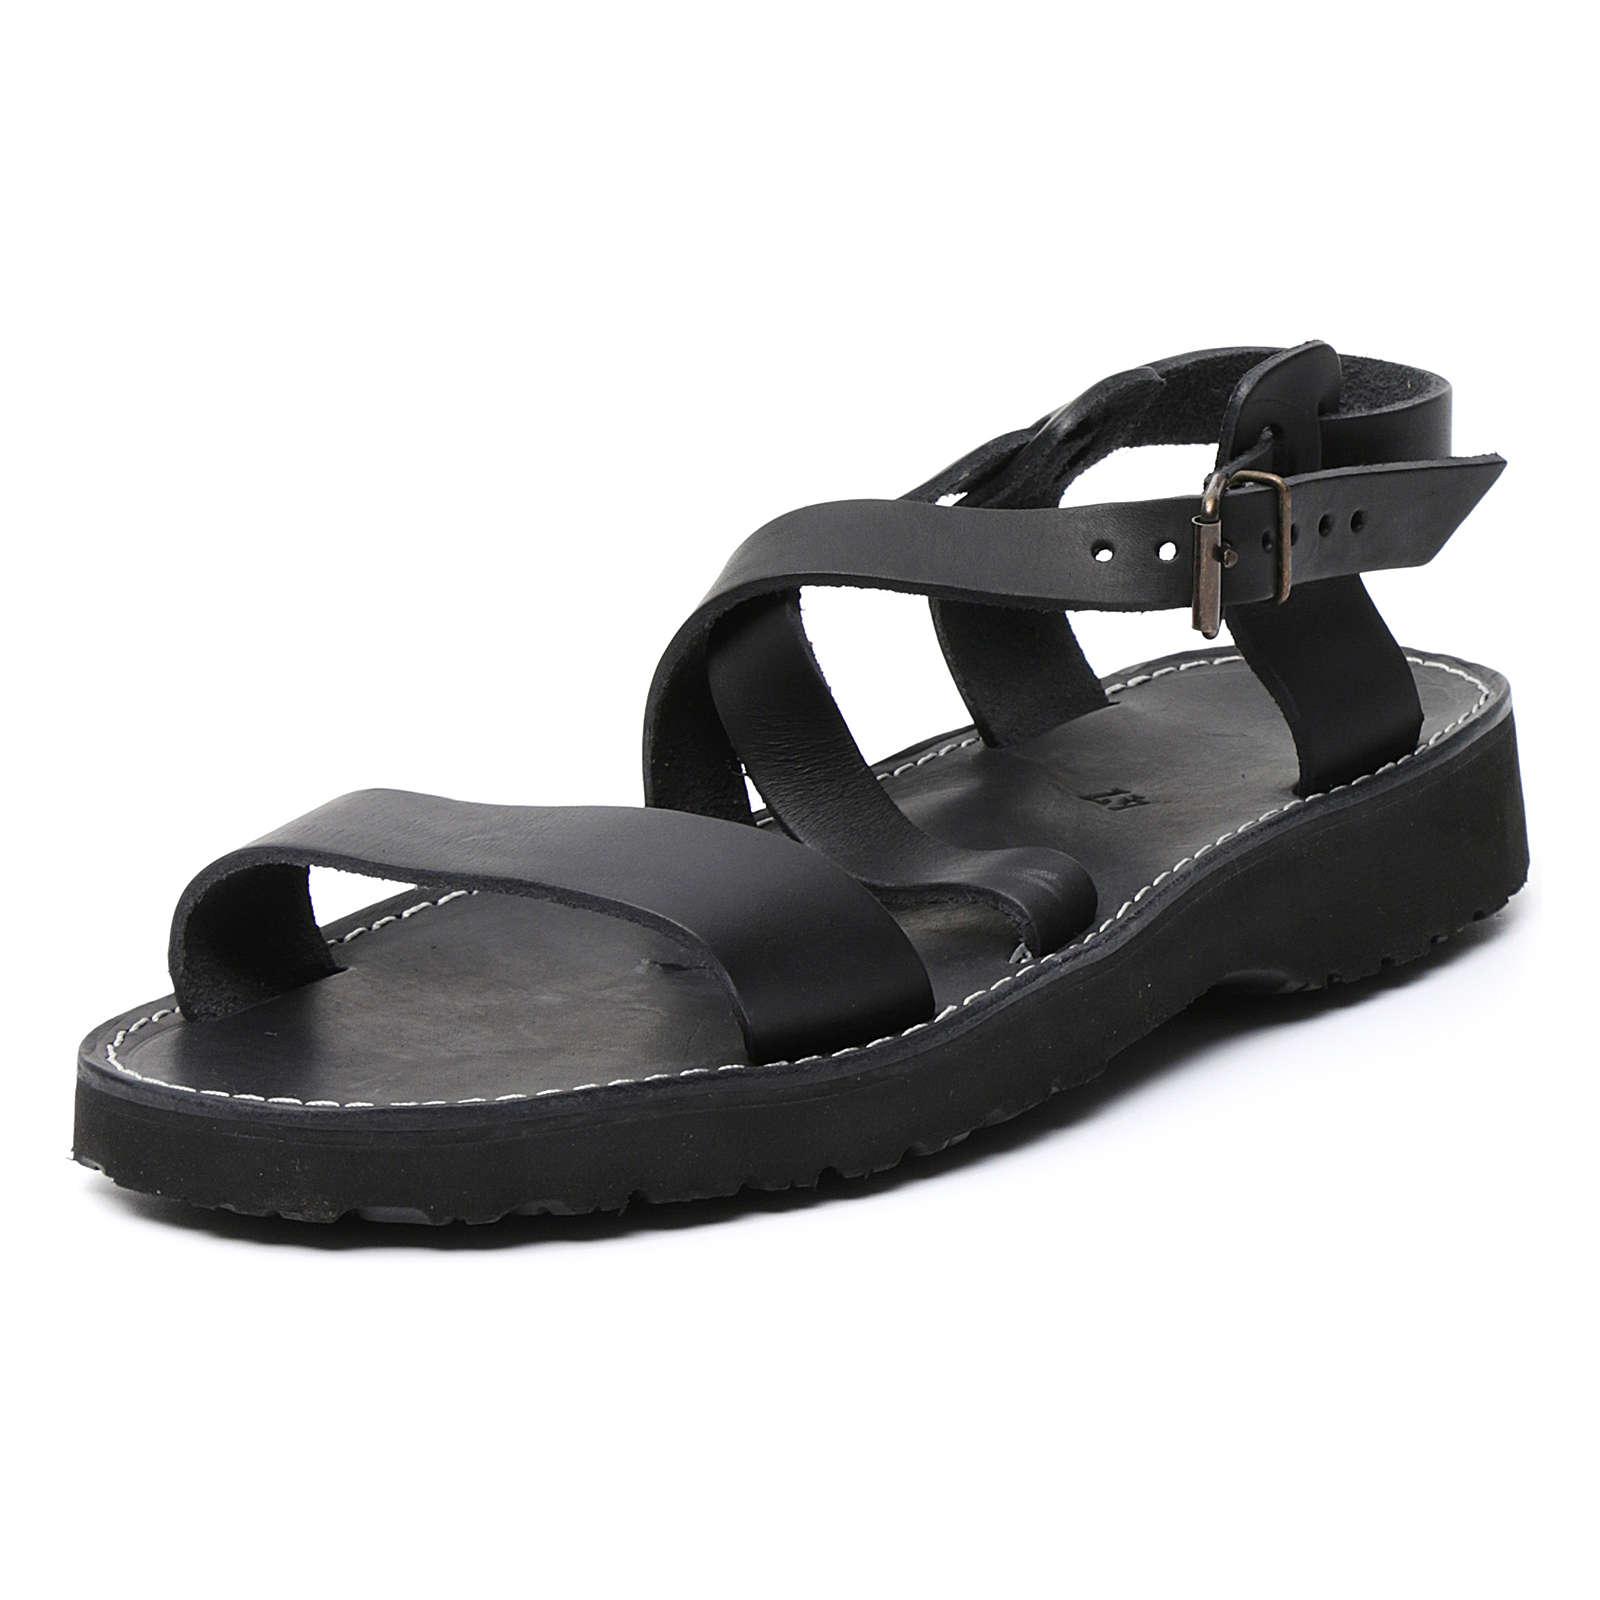 Sandales bénédictins cuir mod. Bethléem Moines Atelier 4